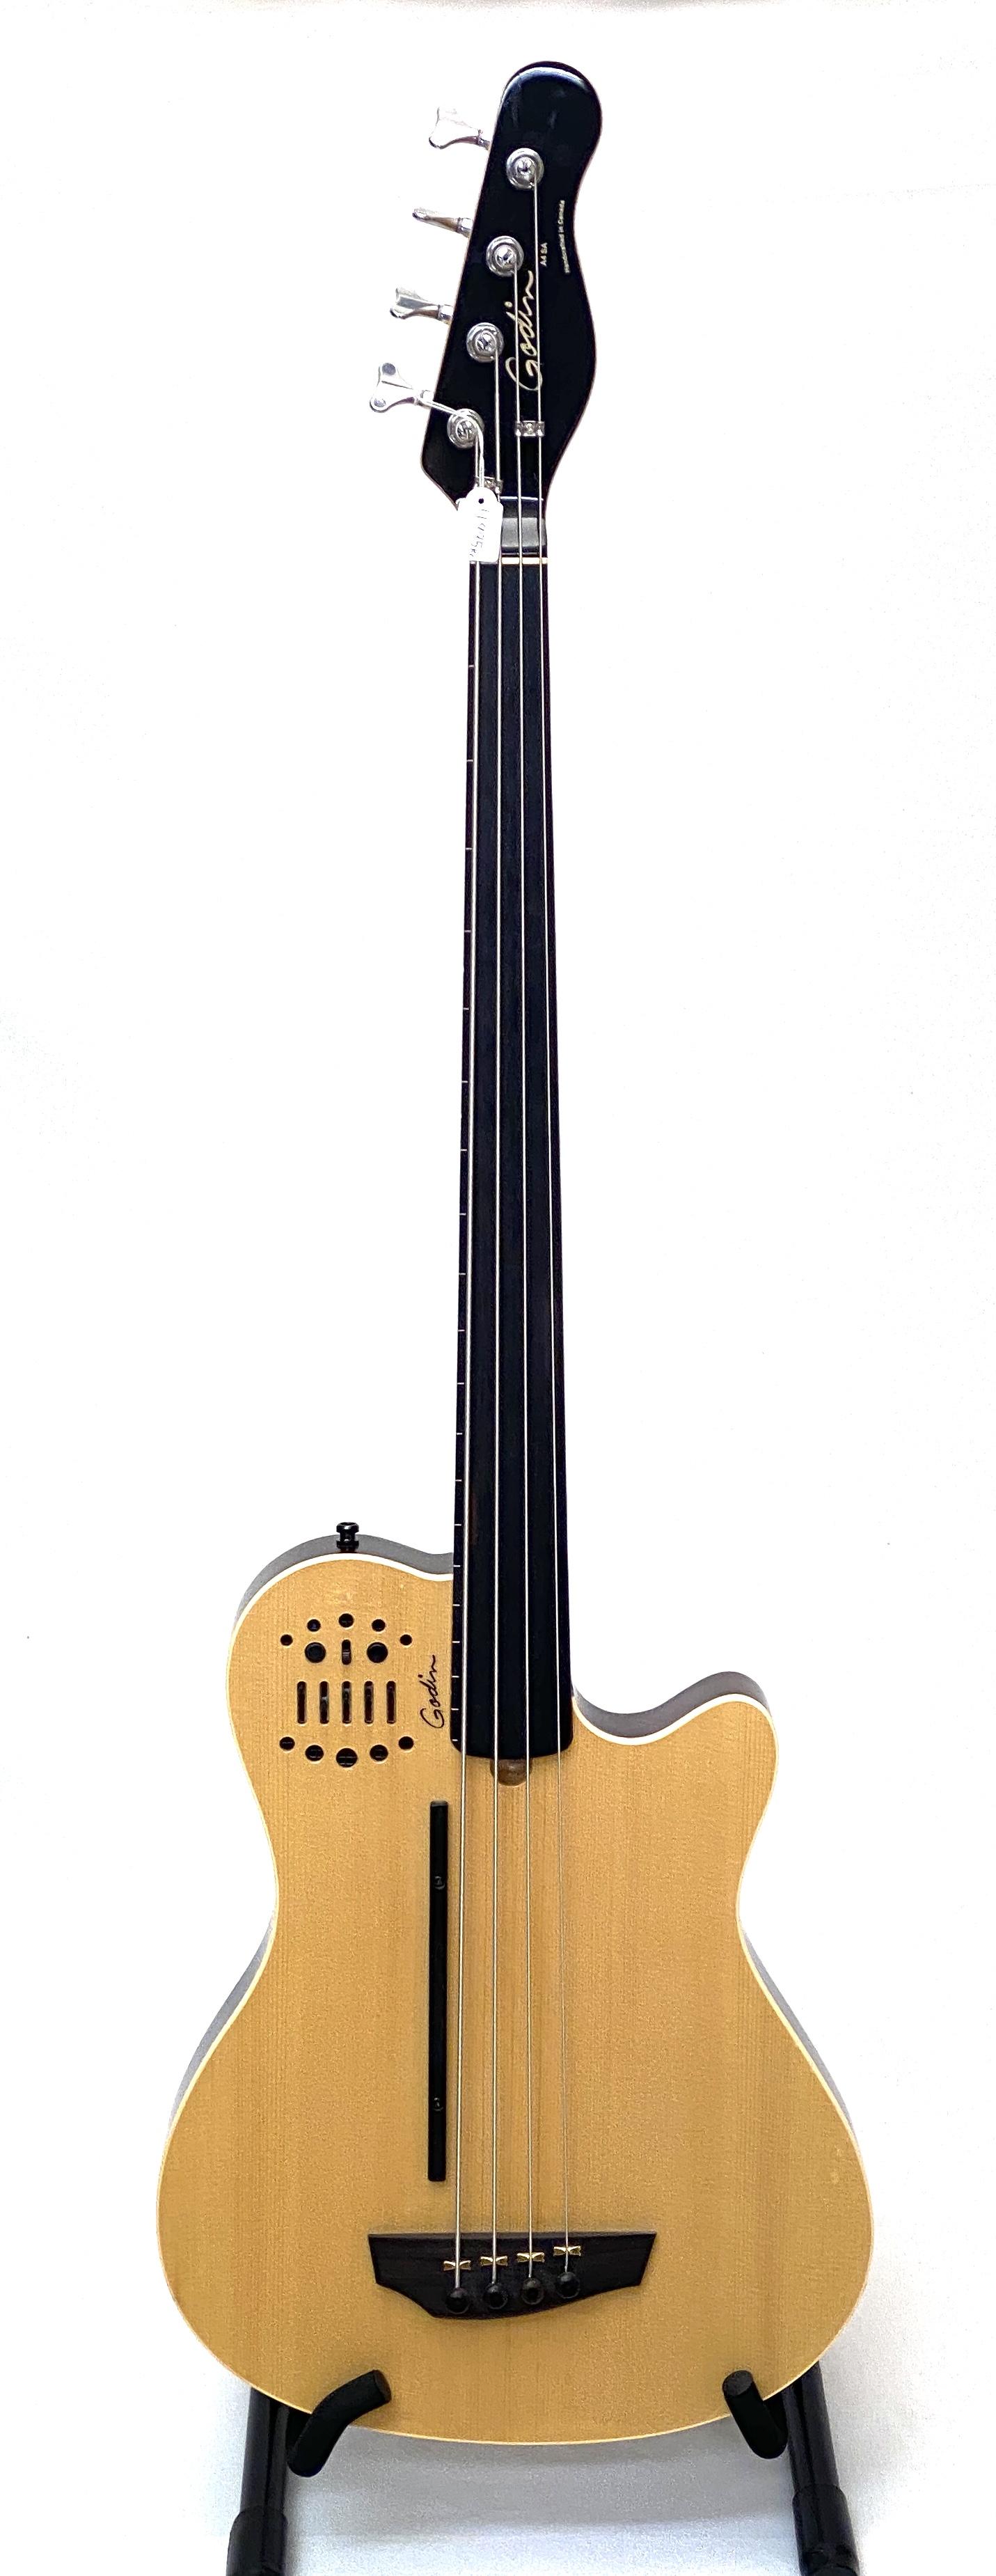 Godin A4 Fretless Bass